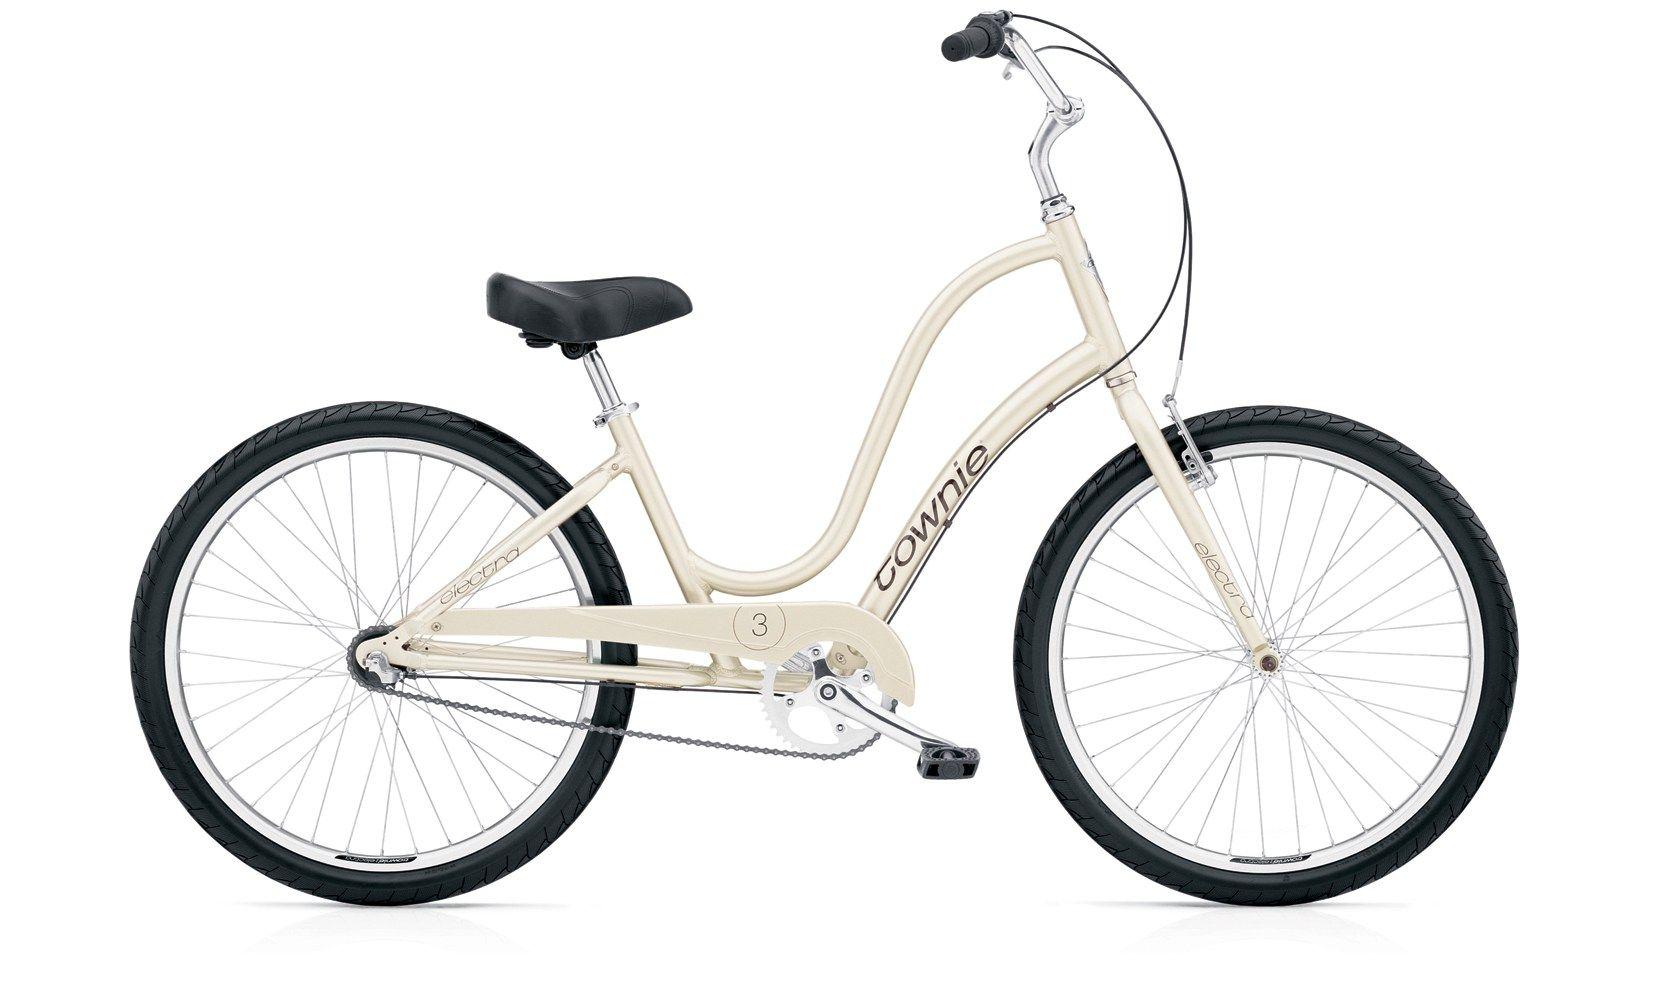 Electra Townie 3i Champagne StepThrough Women's Bike